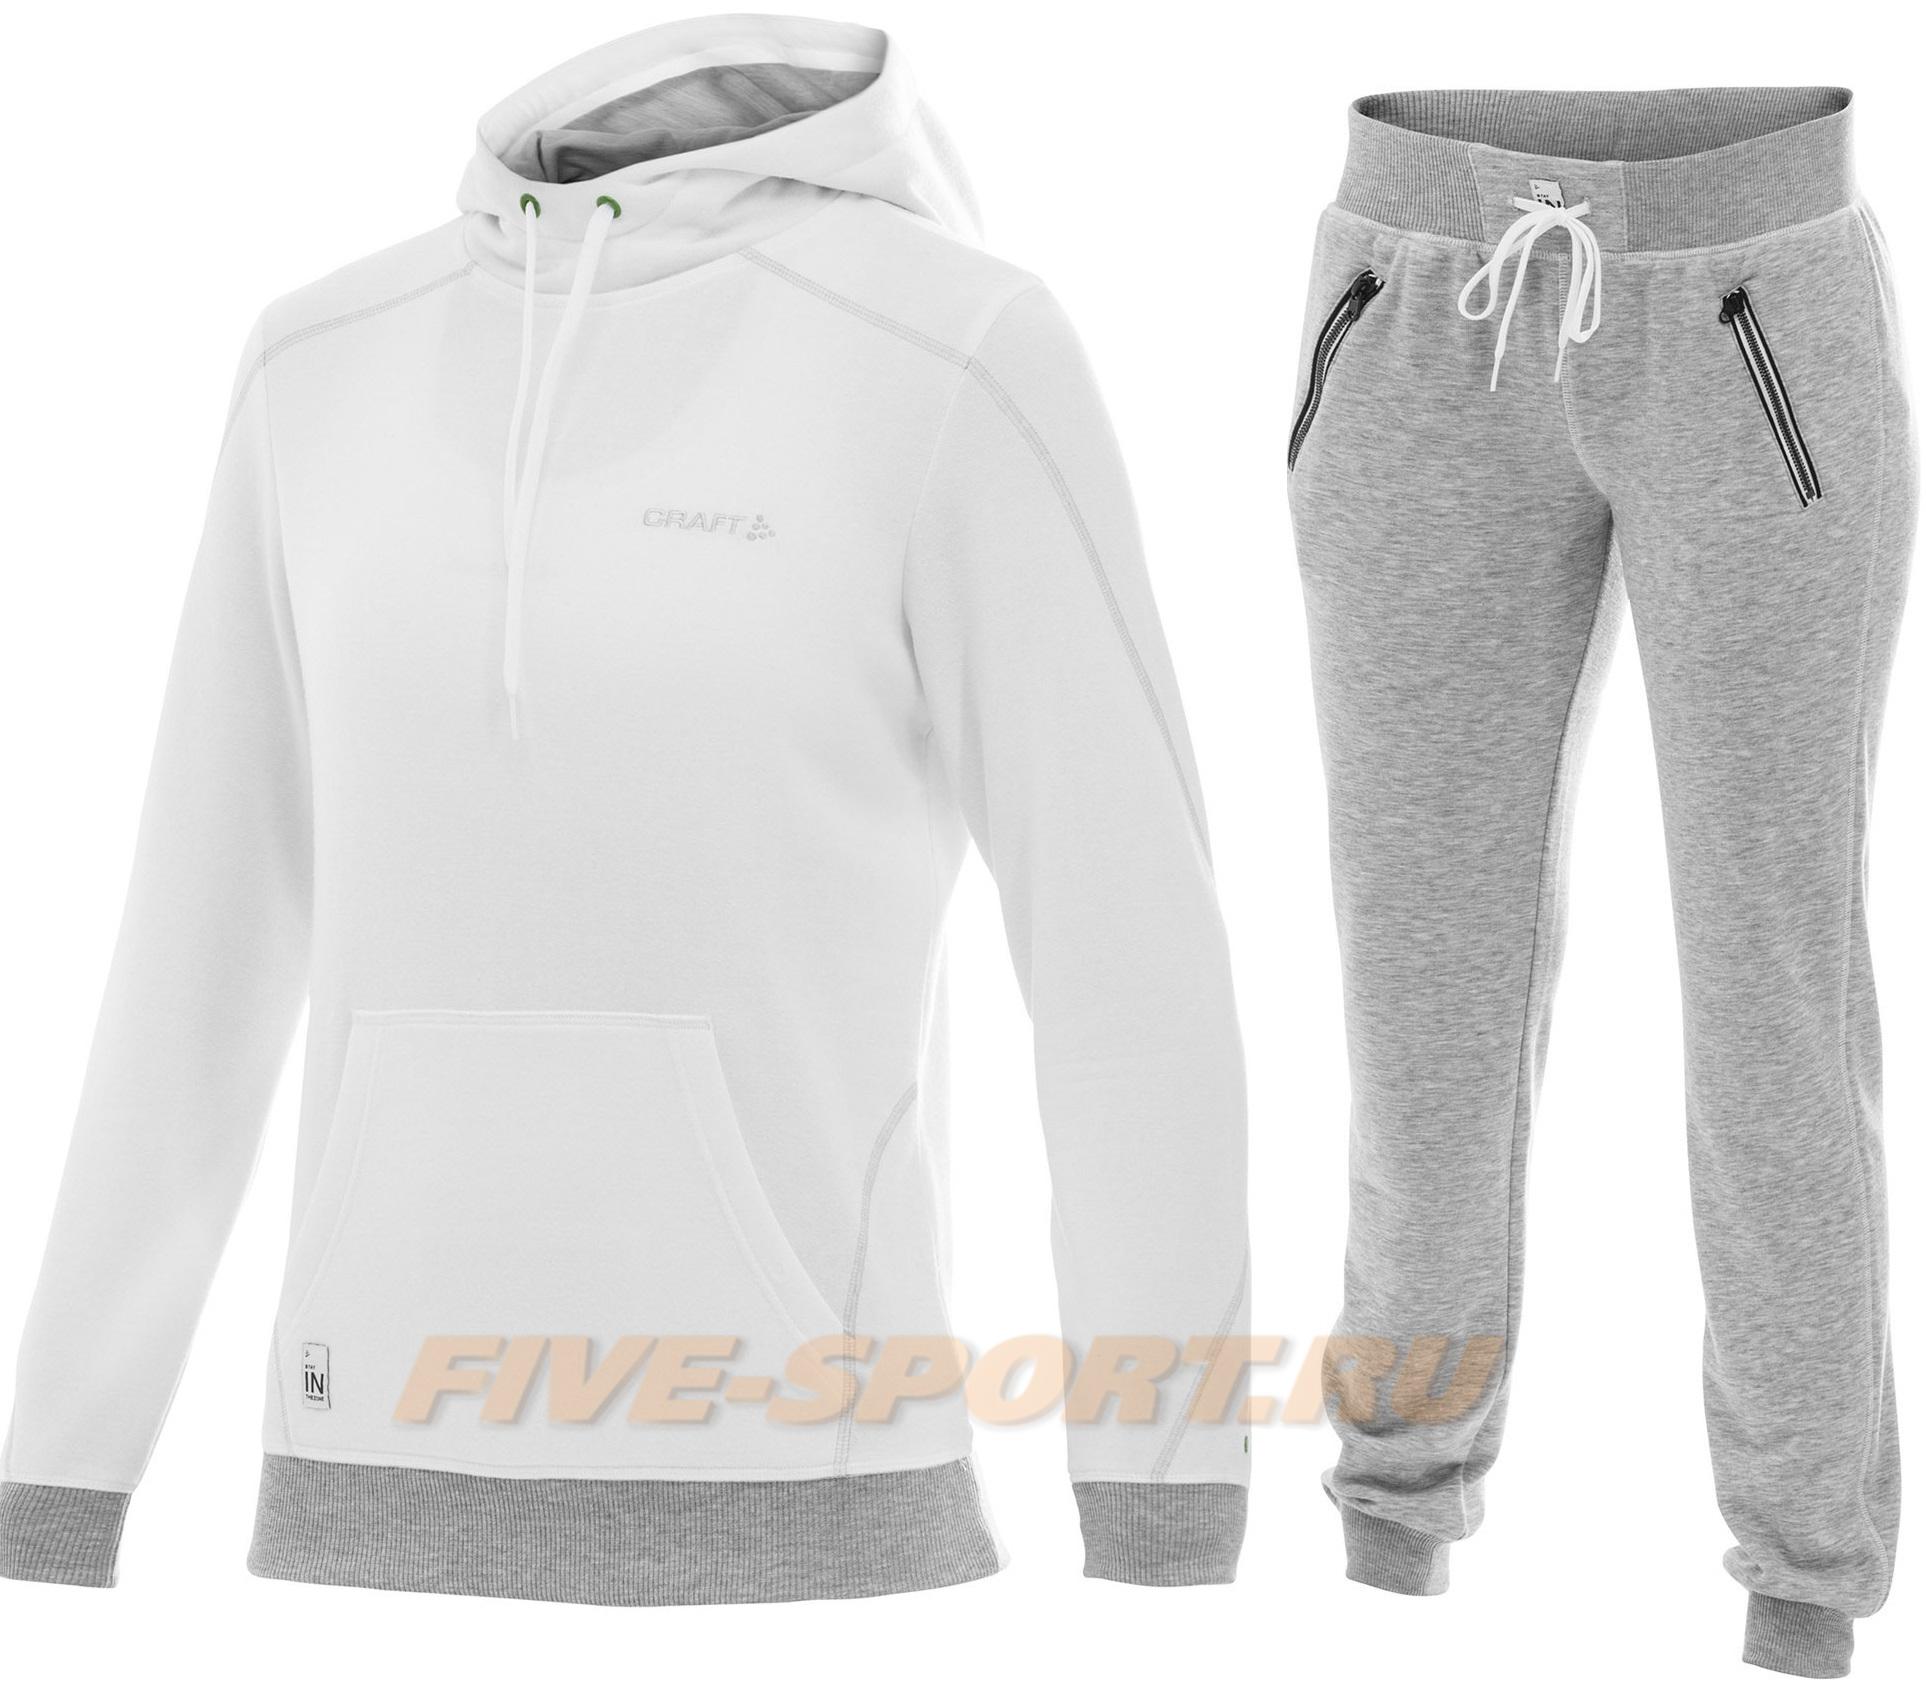 Костюм спортивный женсий Craft In The Zone hood white для бега